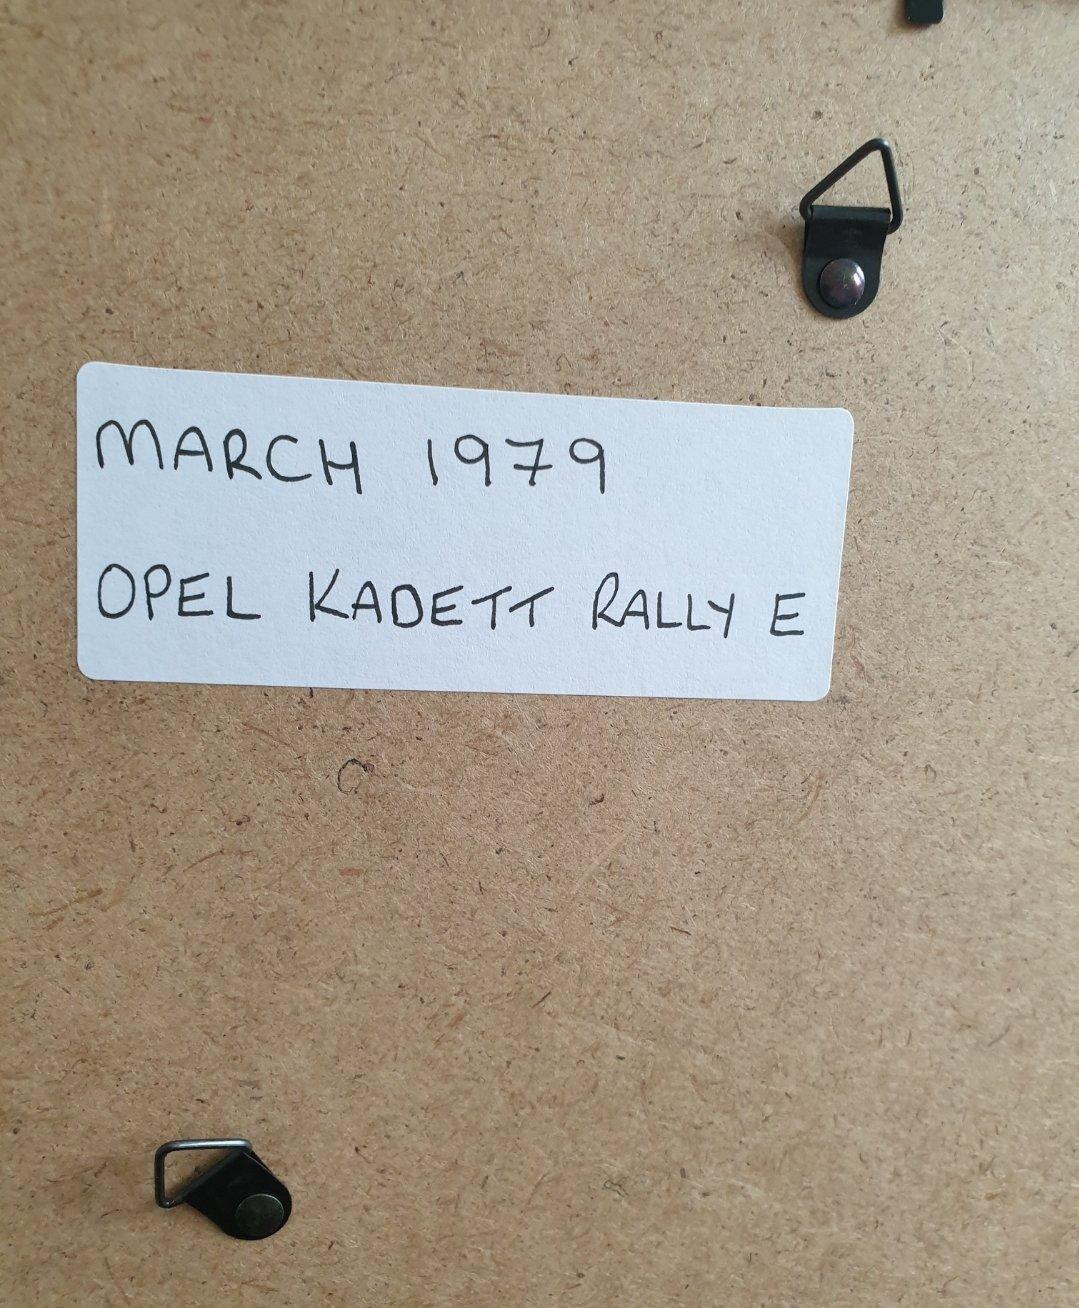 1979 Original Opel Kadett Framed Advert For Sale (picture 2 of 2)